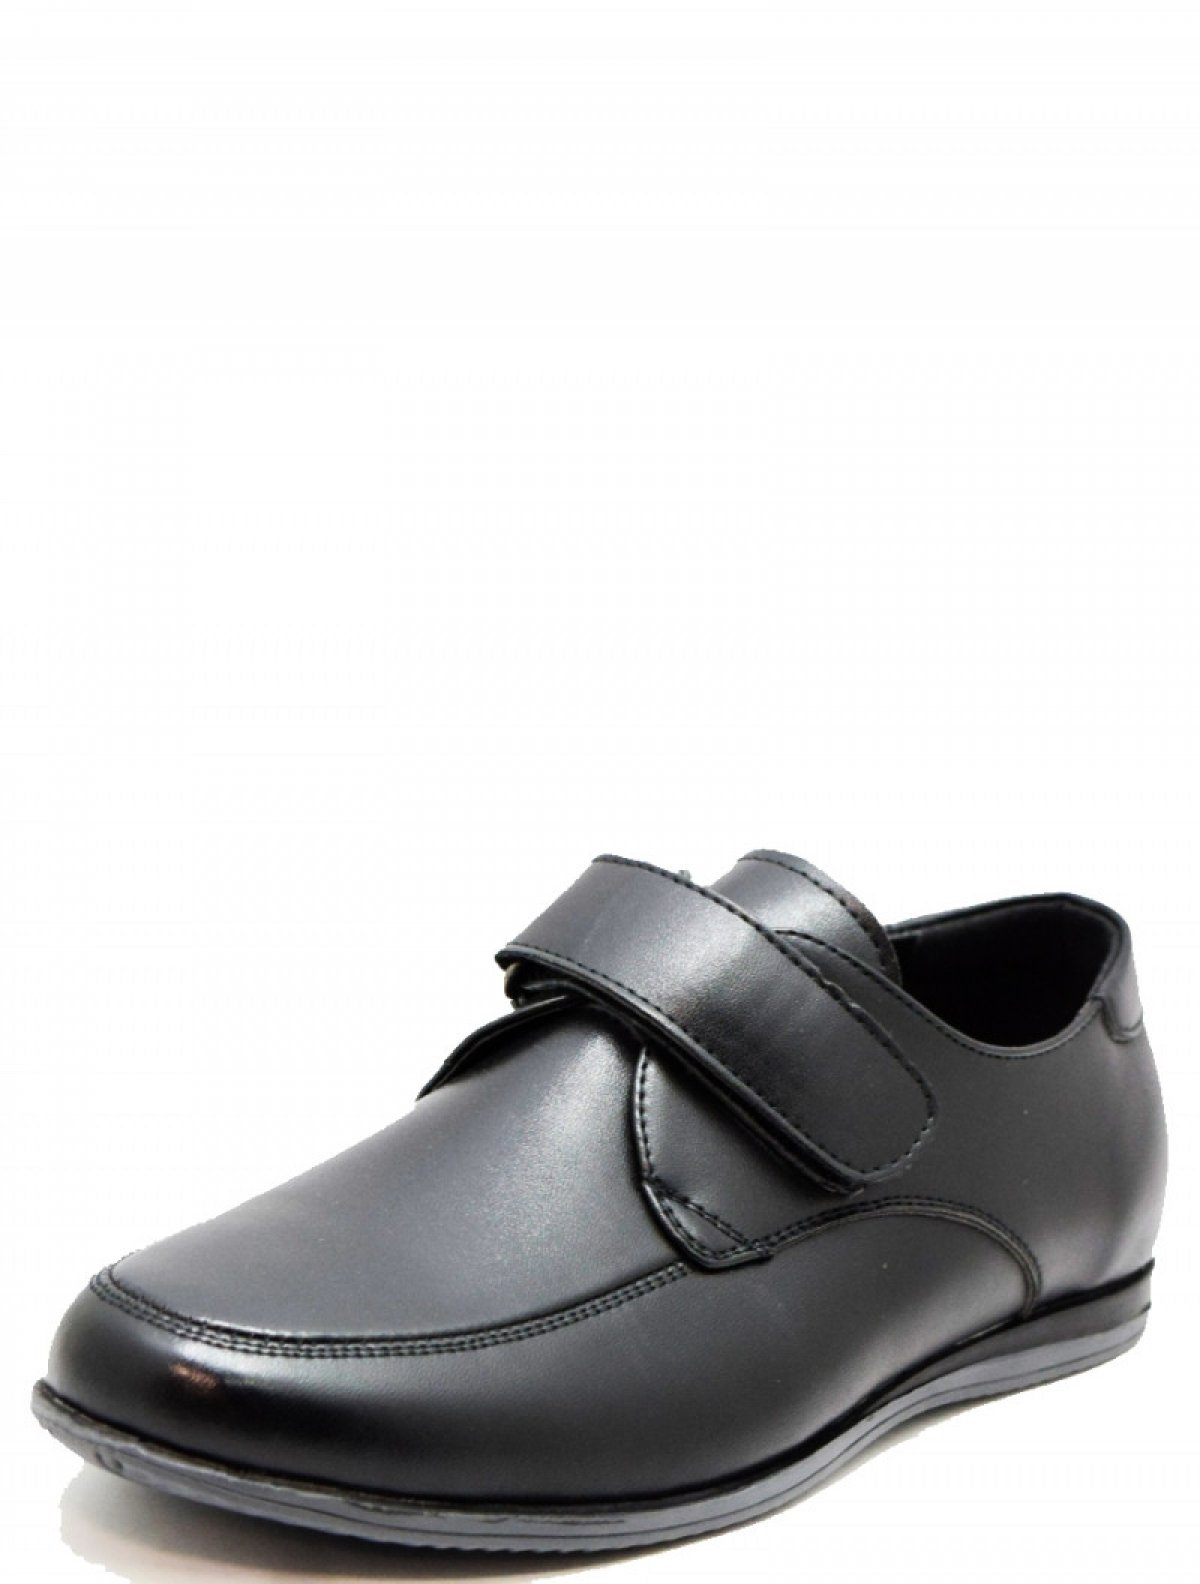 Bimko-D AA110789 туфли для мальчика